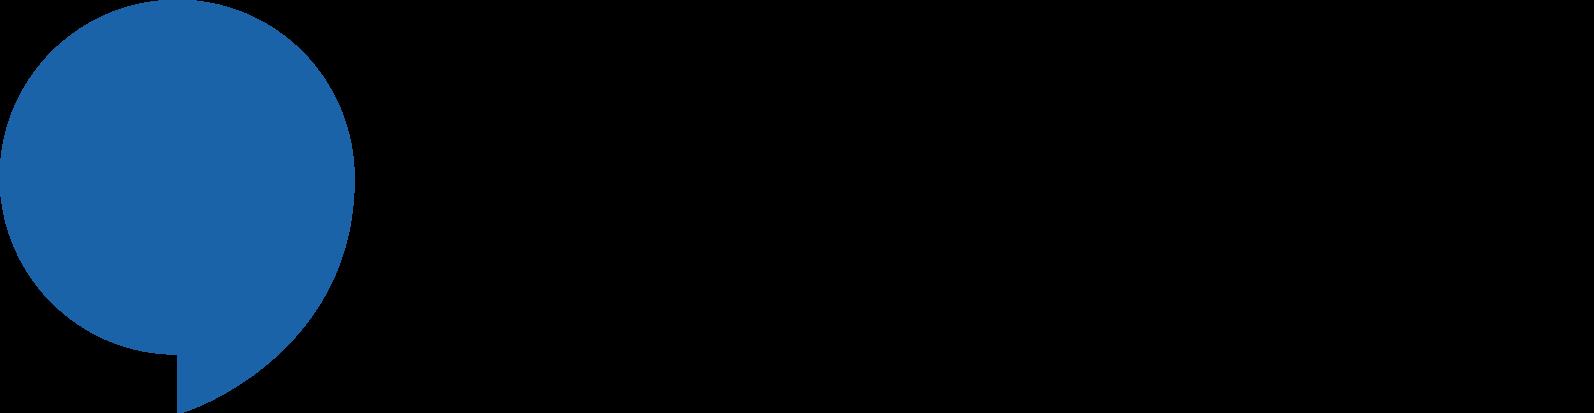 Mj55rf6ts7lh4nhg11f